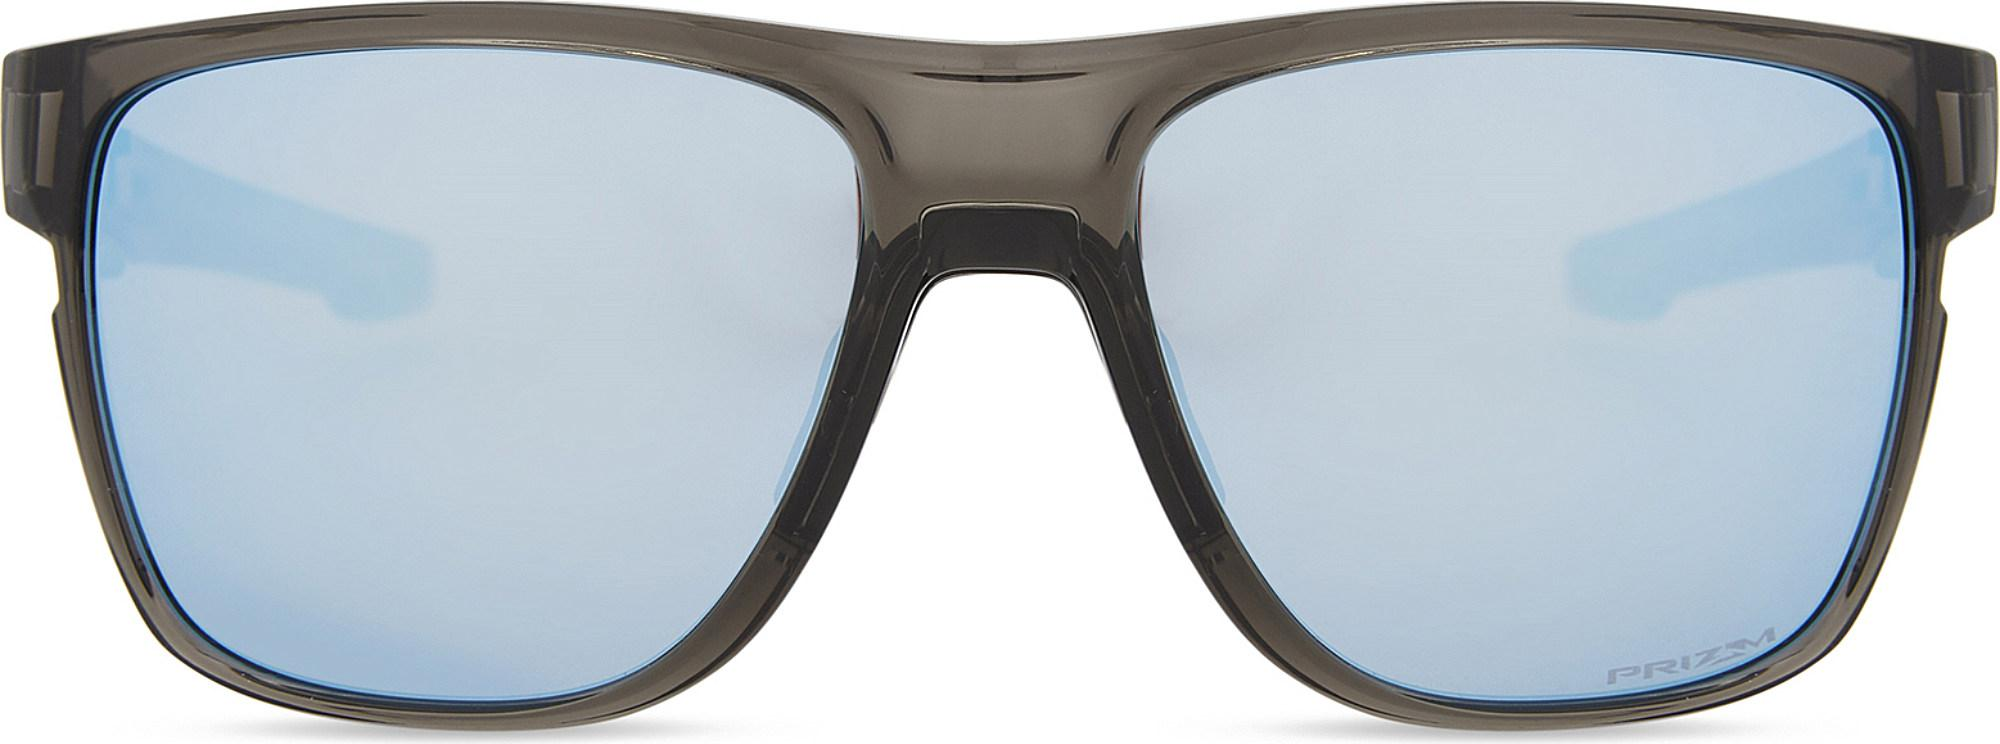 a525fcf551a Oakley - Gray Crossrange Xl Prizmtm Deep Water Polarised Square-frame  Sunglasses - Lyst. View fullscreen